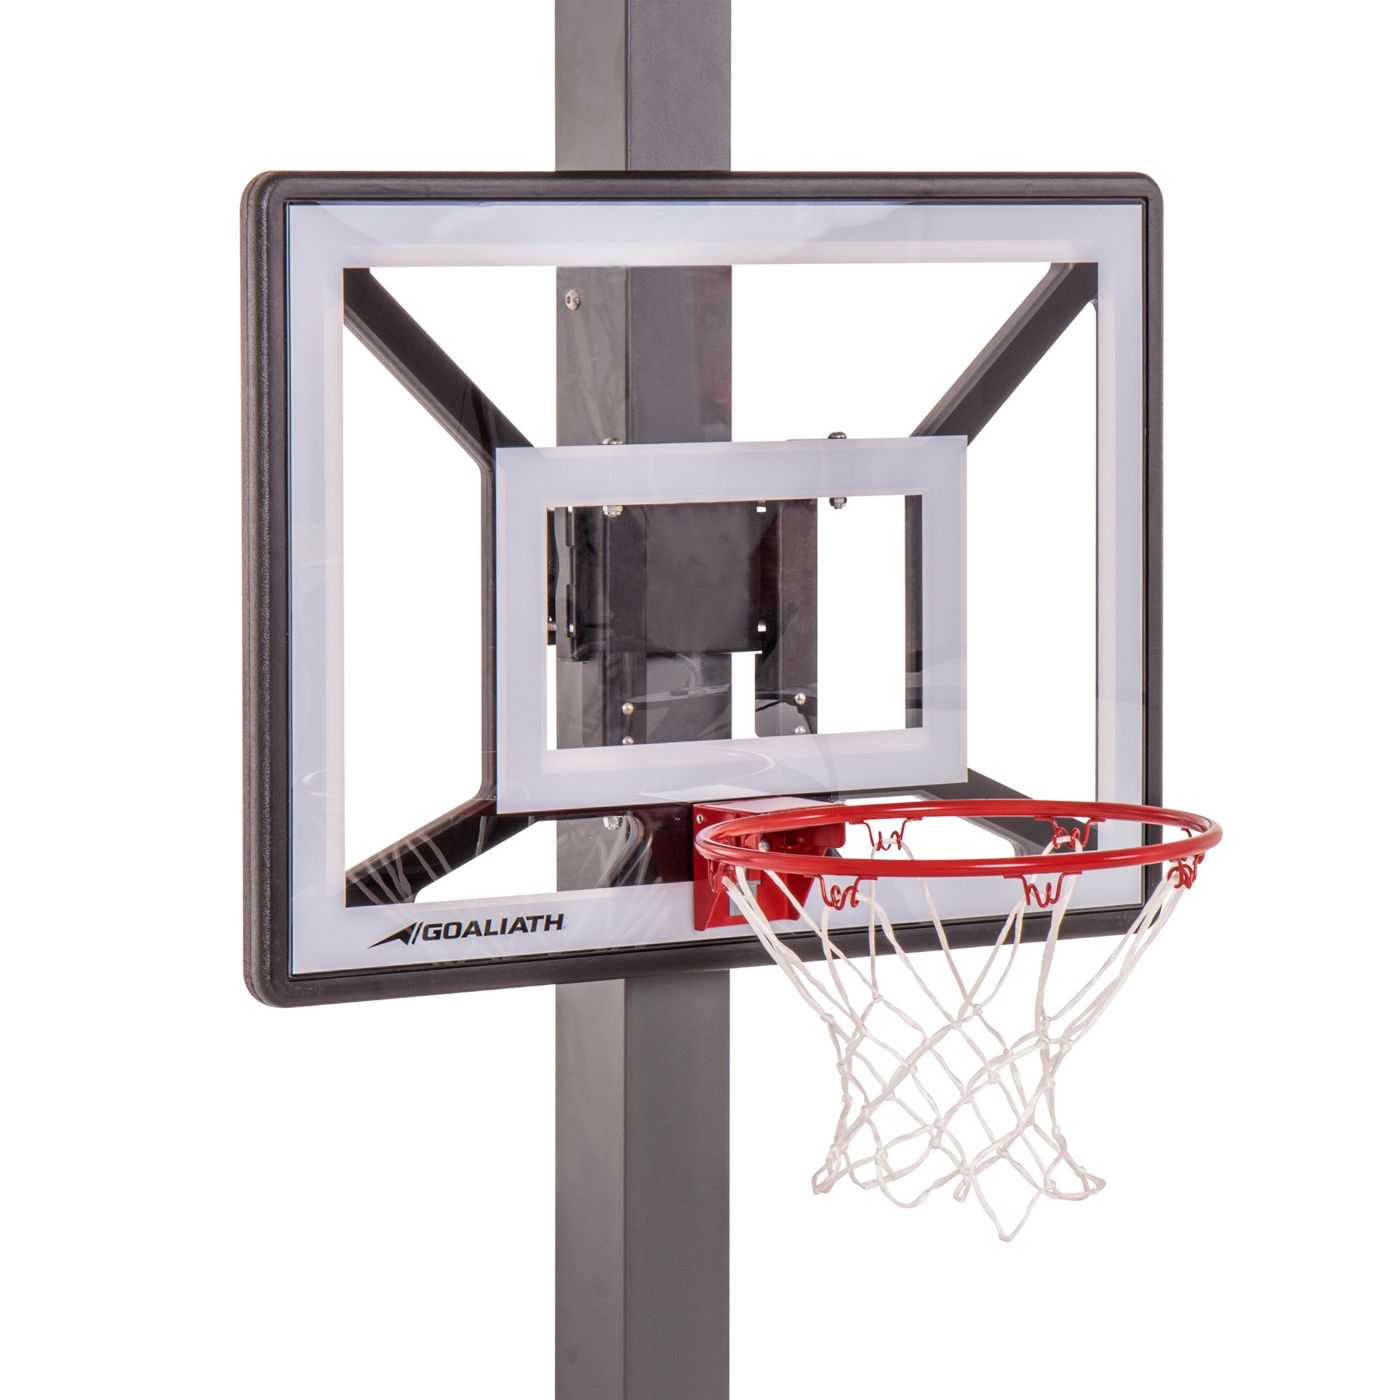 Goaliath Junior Basketball Hoop